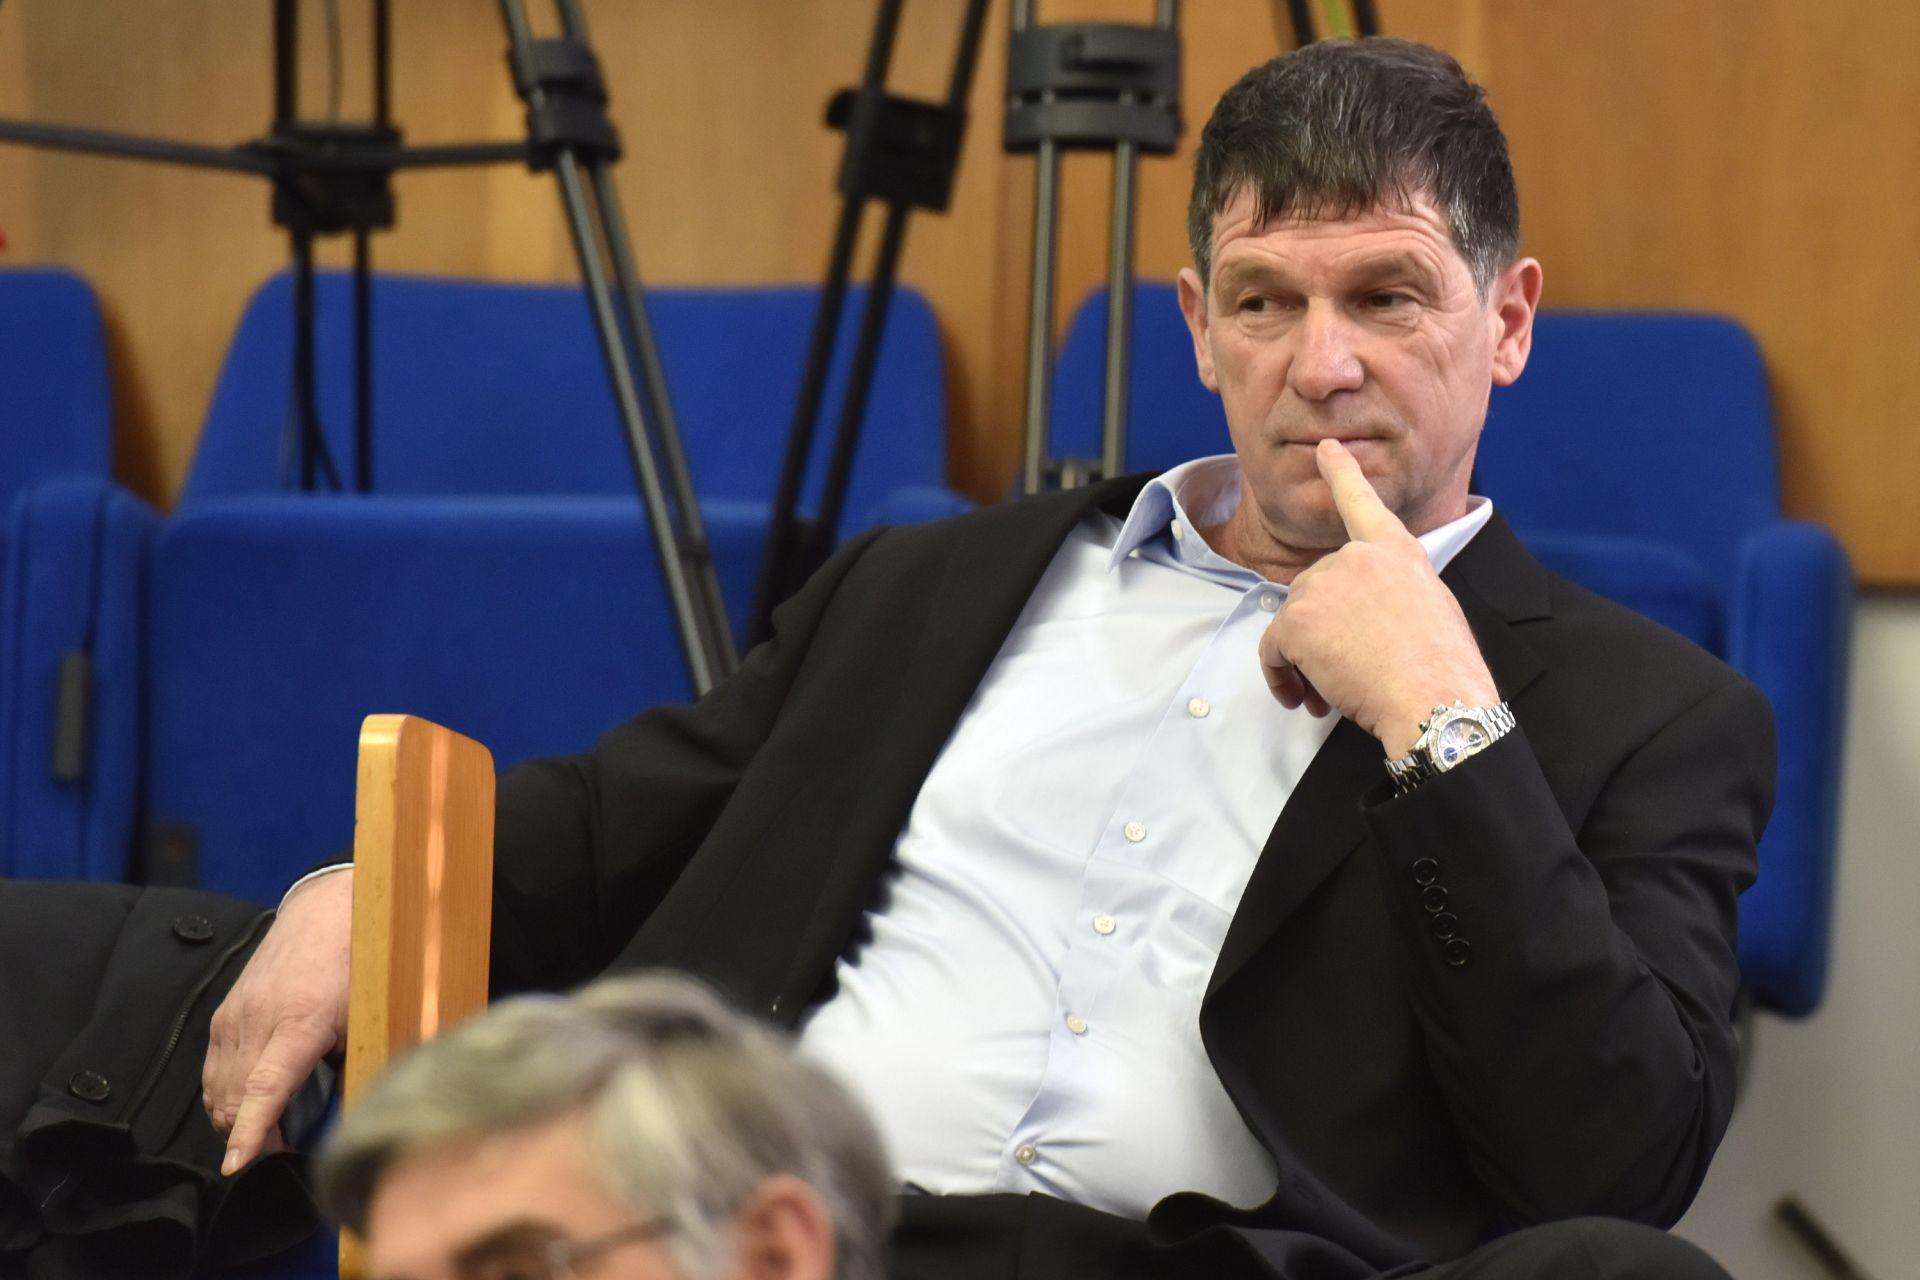 AGENCIJA ZA ELEKTRONIČKE MEDIJE: Trajno oduzeta koncesija televiziji Rena Sinovčića